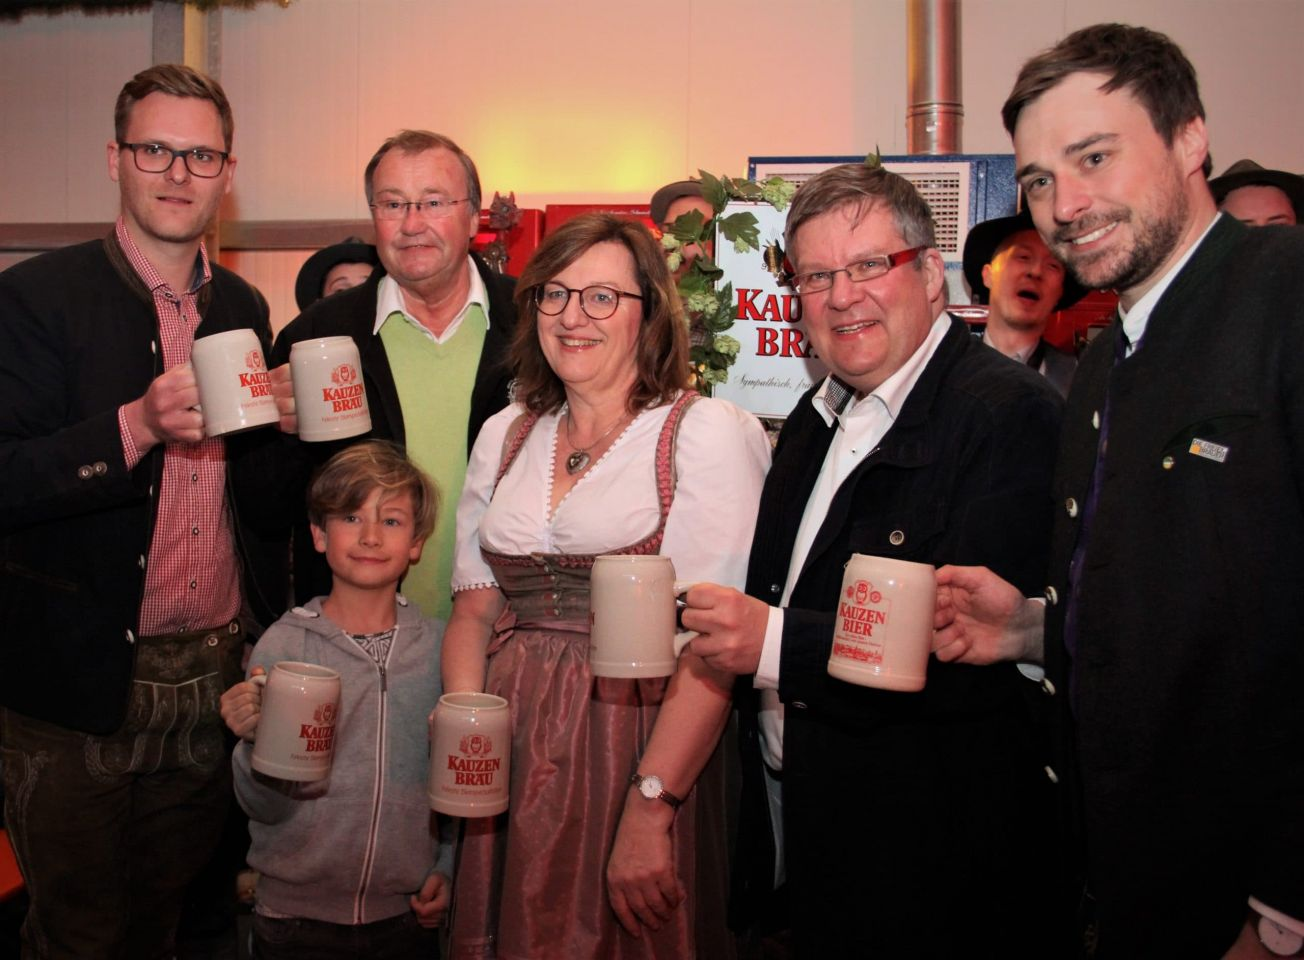 Kauzen-Bräu in Ochsenfurt: Drei Feste im Jahr 2020